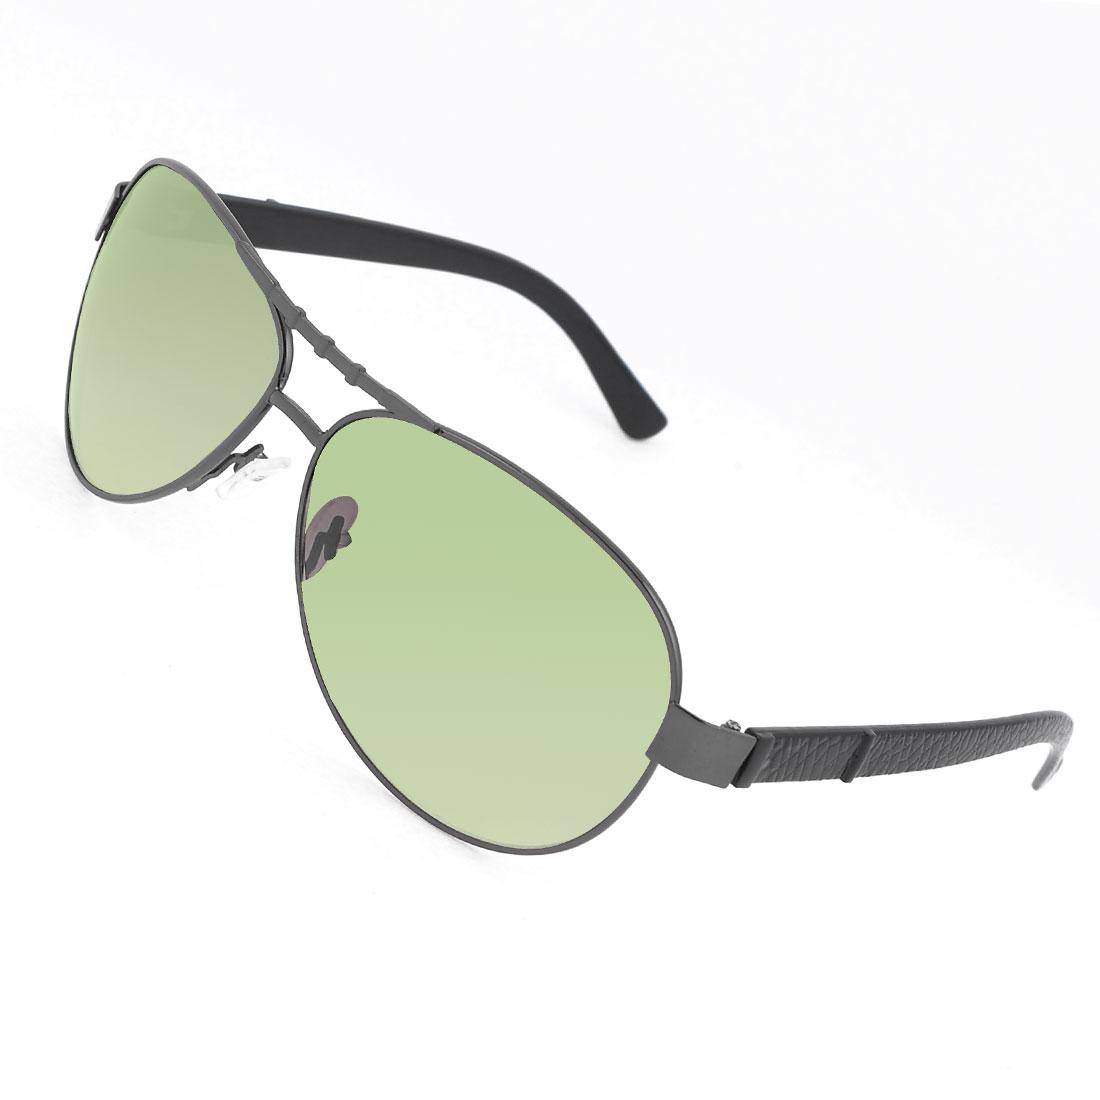 Eye Protector Green Lens Black Plastic Arms Glasses Sunglasses for Man